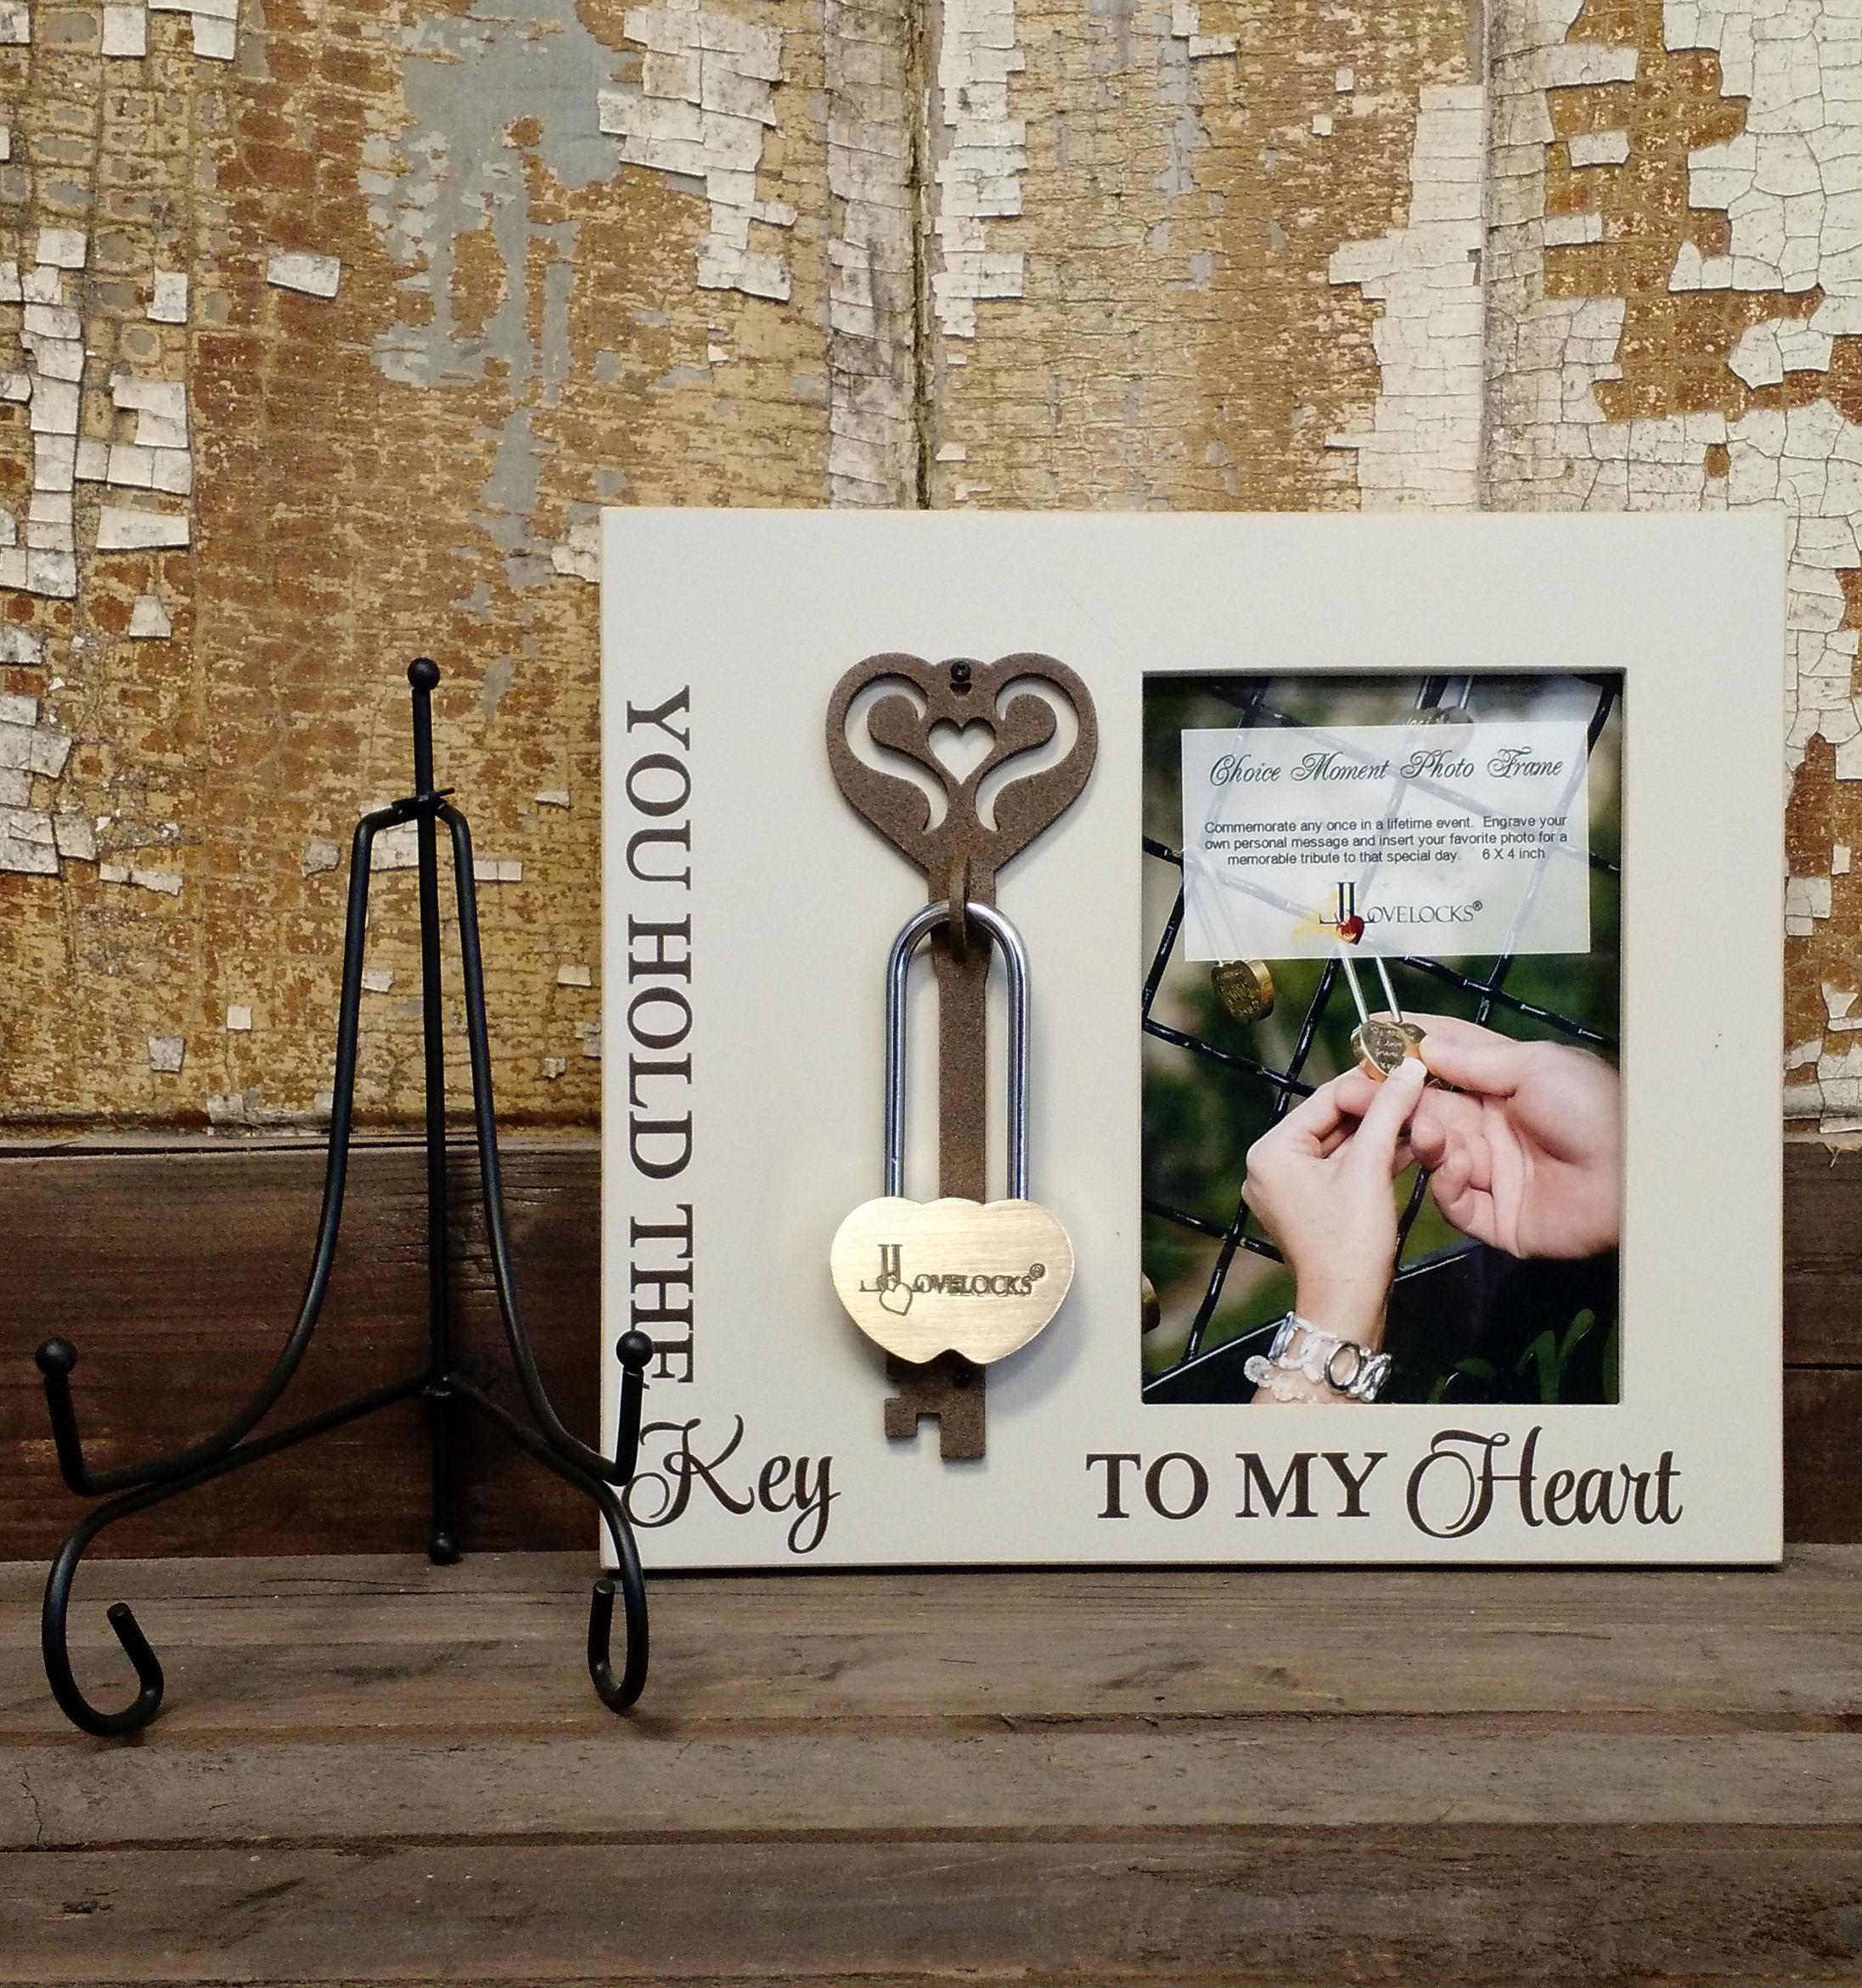 LoveLocks® Key To My Heart Photo Frame – Lovelocks